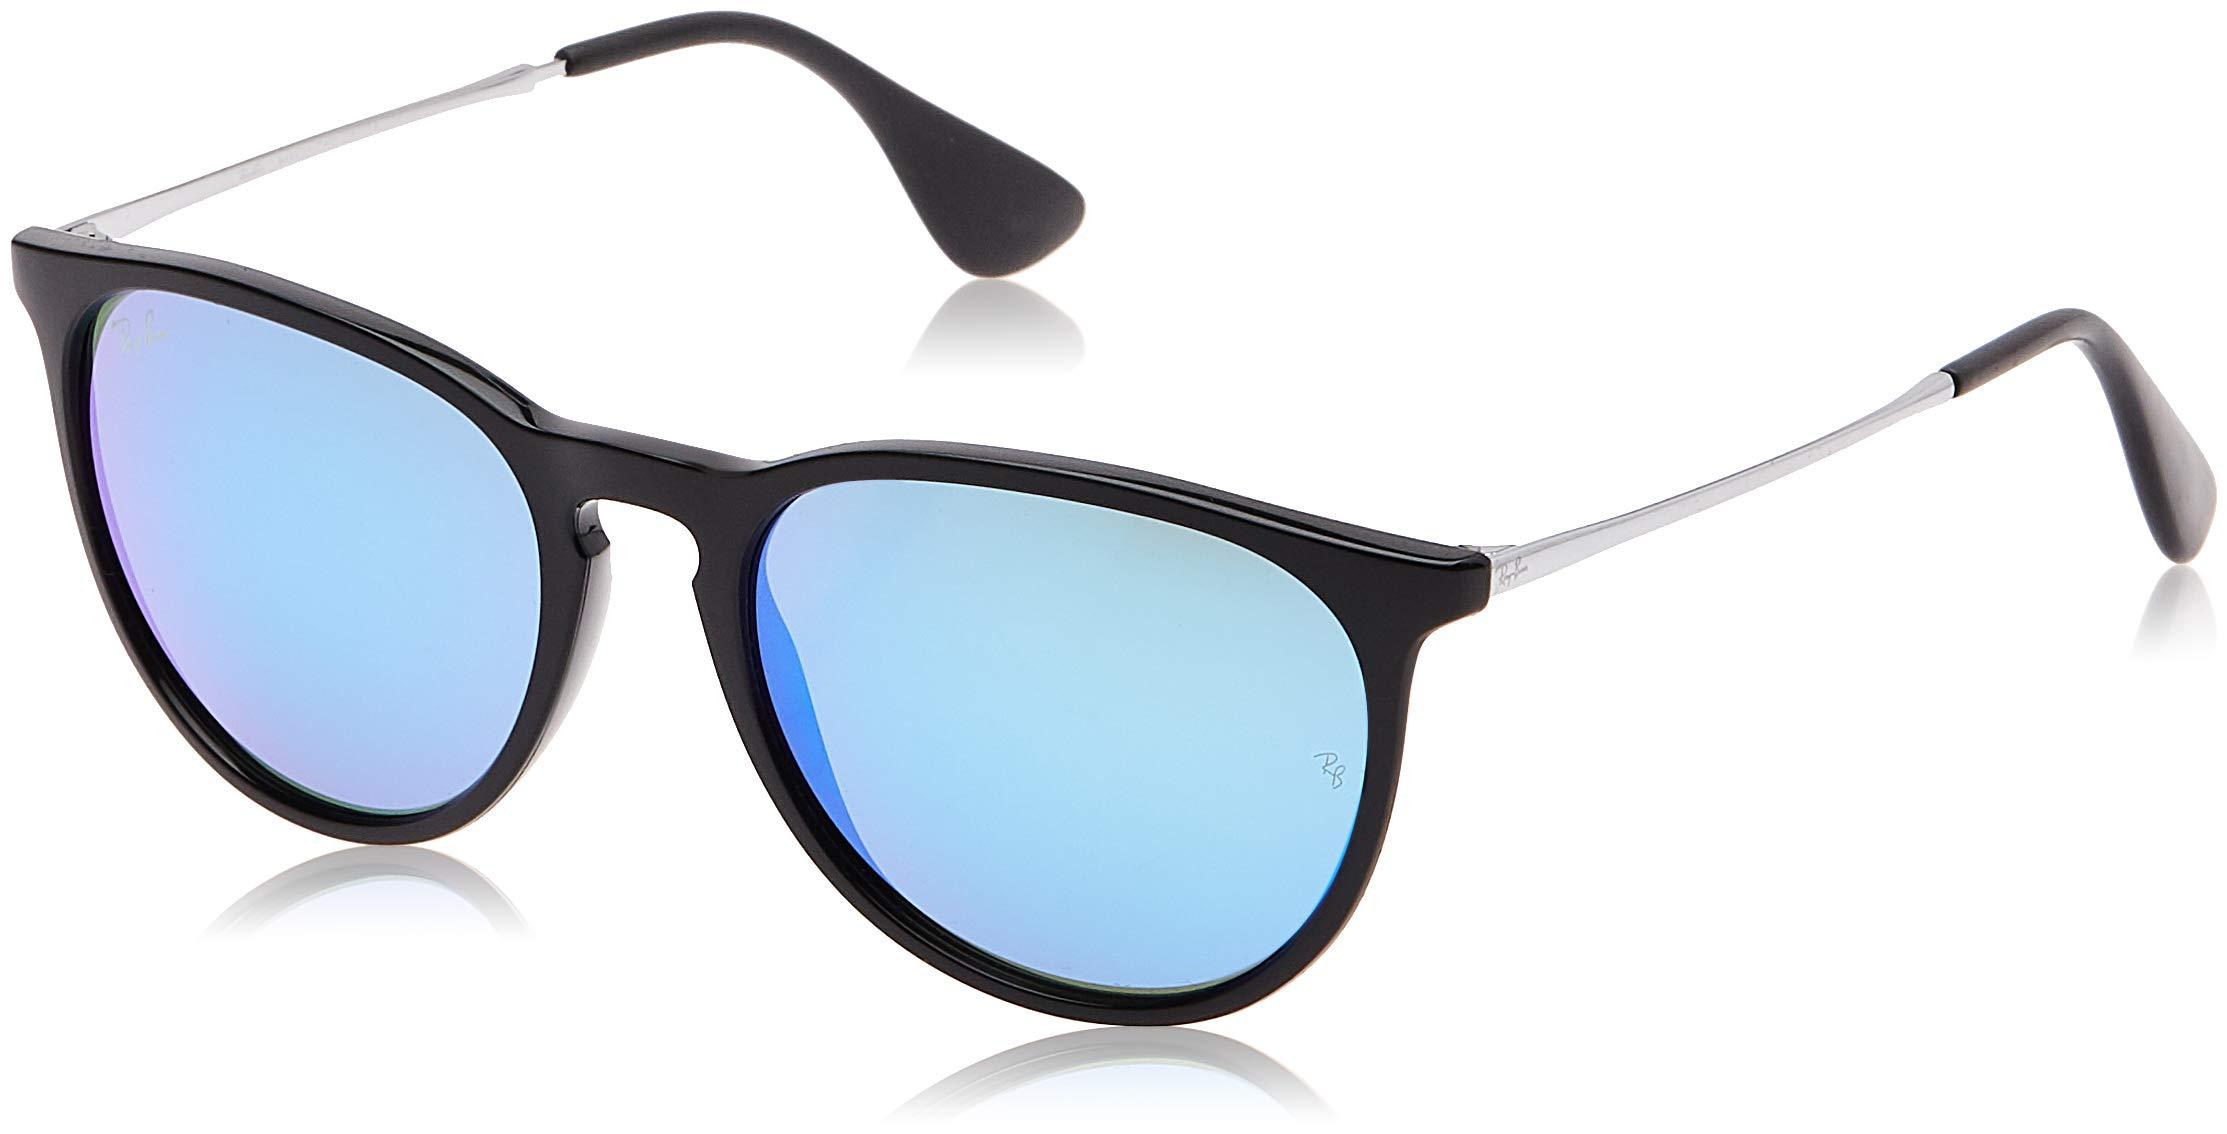 RAY-BAN RB4171 Erika Round Sunglasses, Black/Blue Mirror, Blue Mirror by RAY-BAN